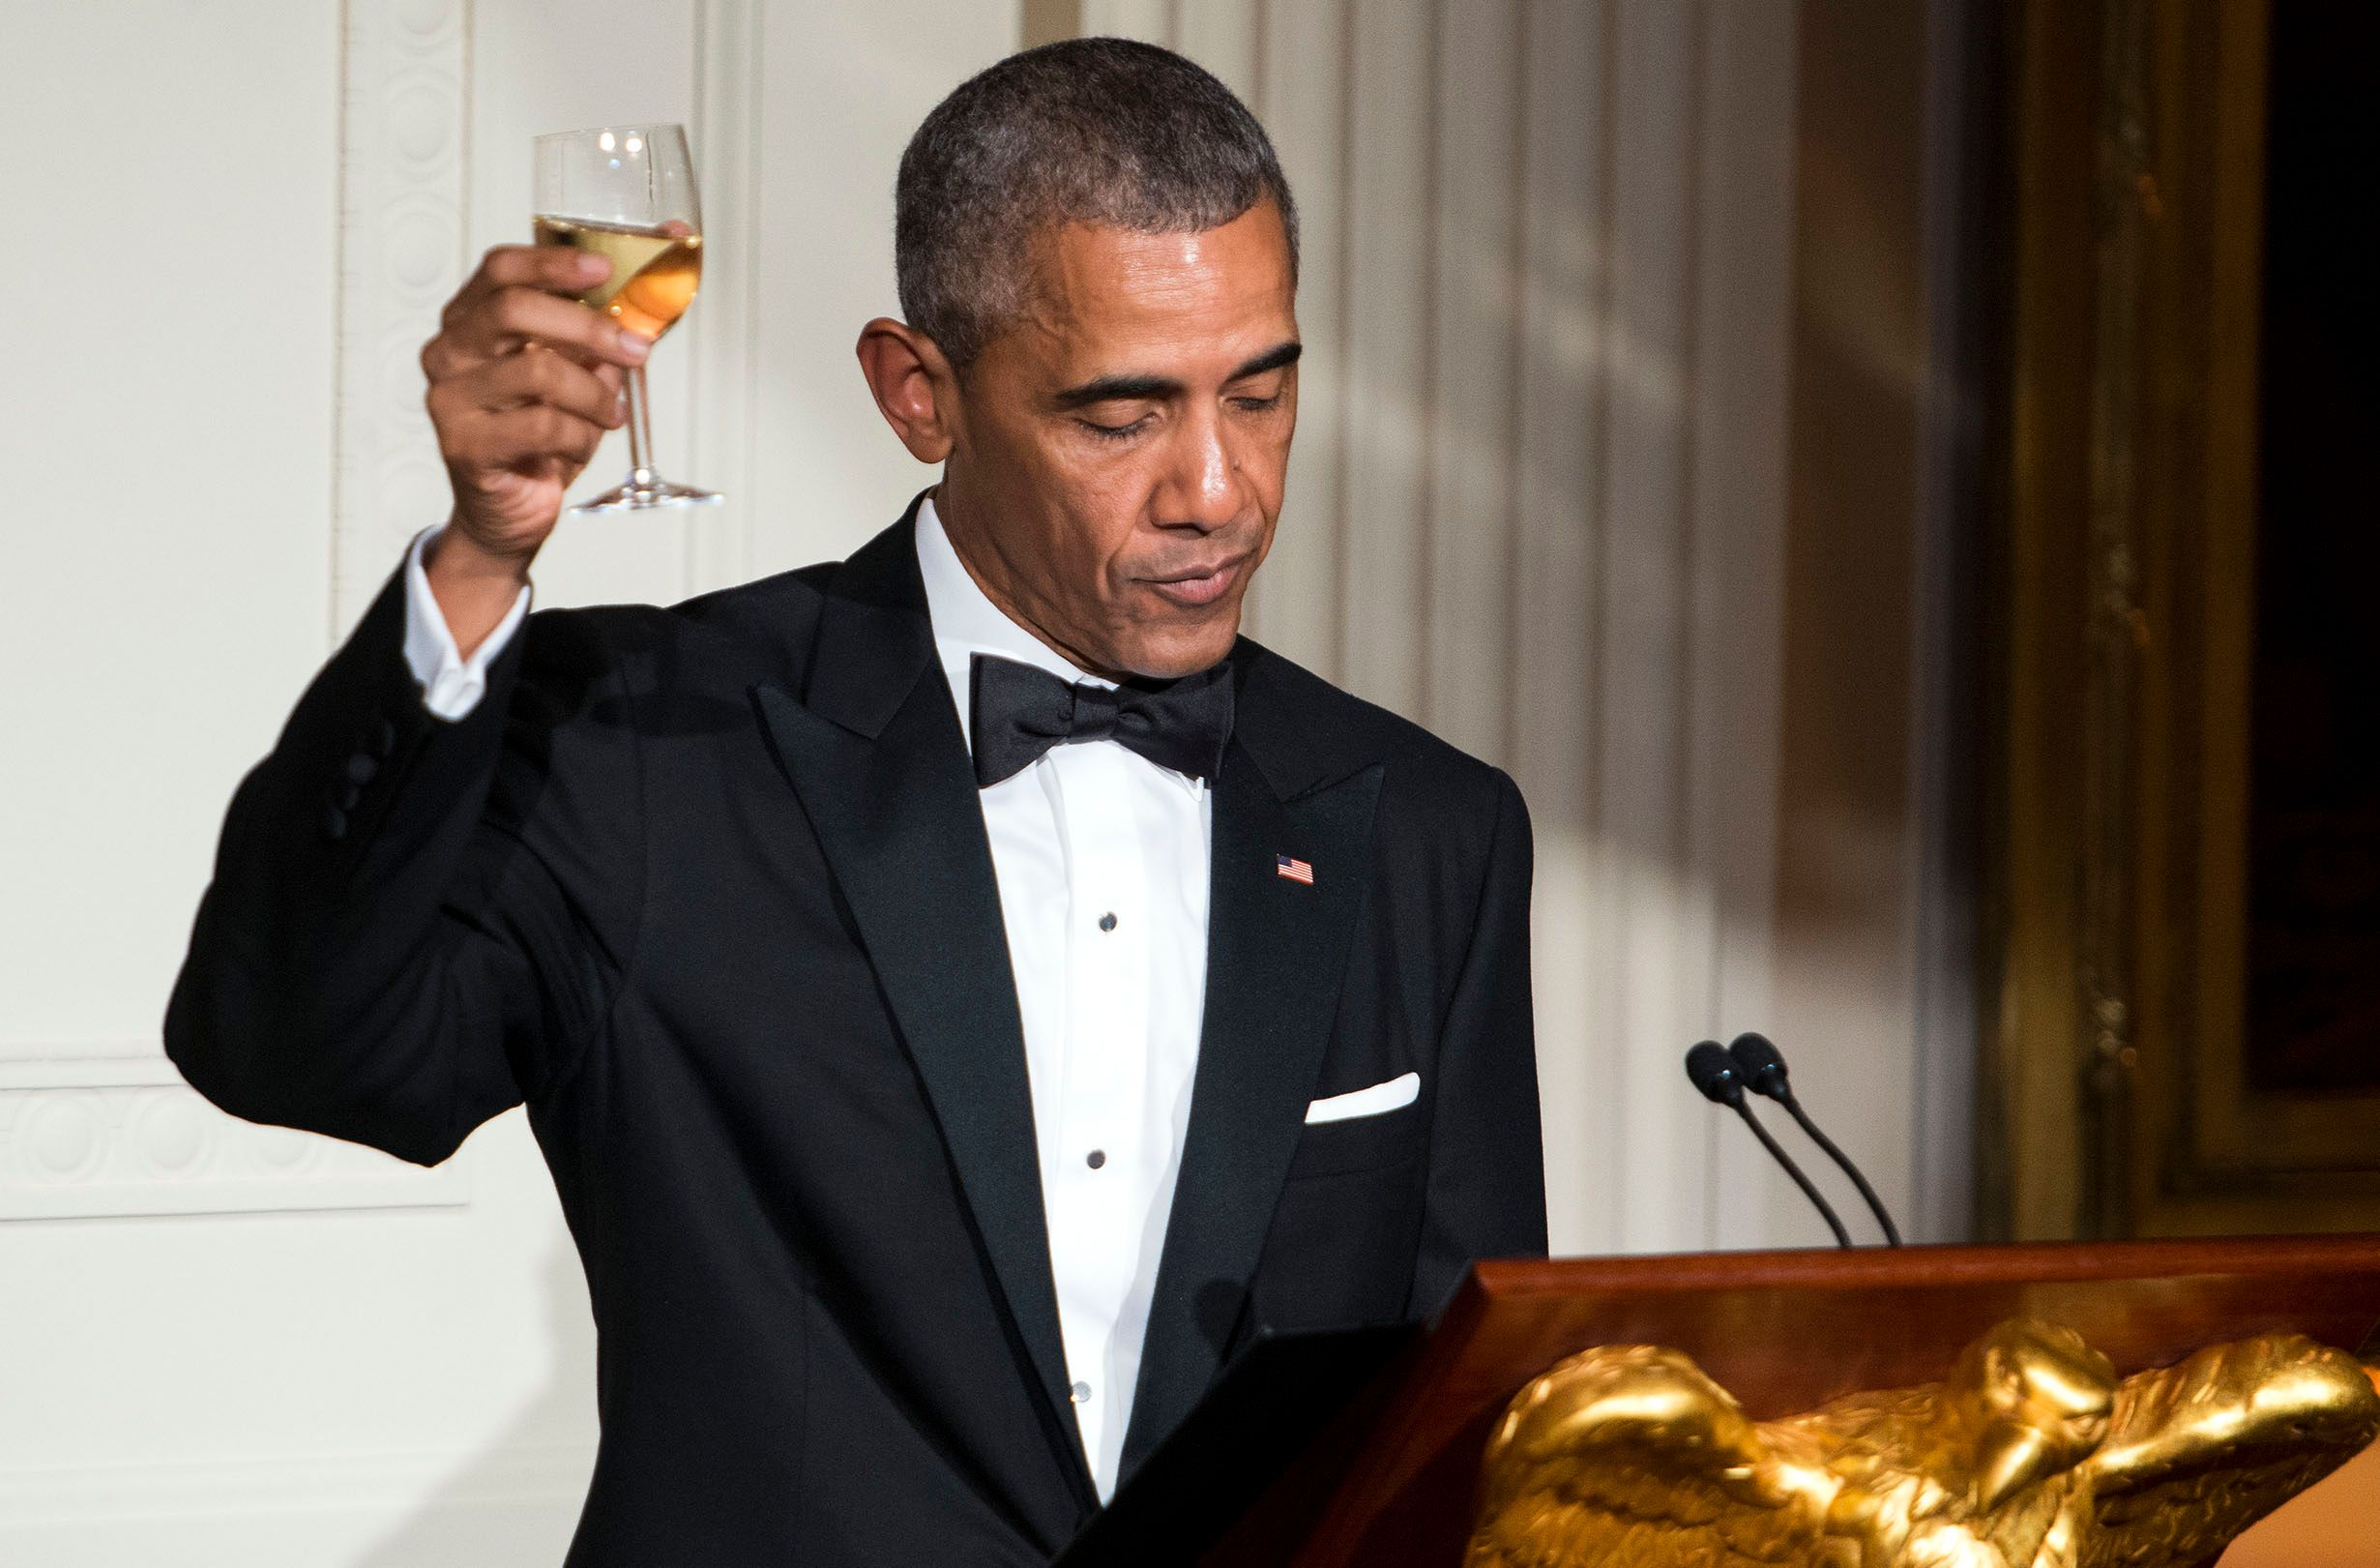 ObamaToastWeb.jpg